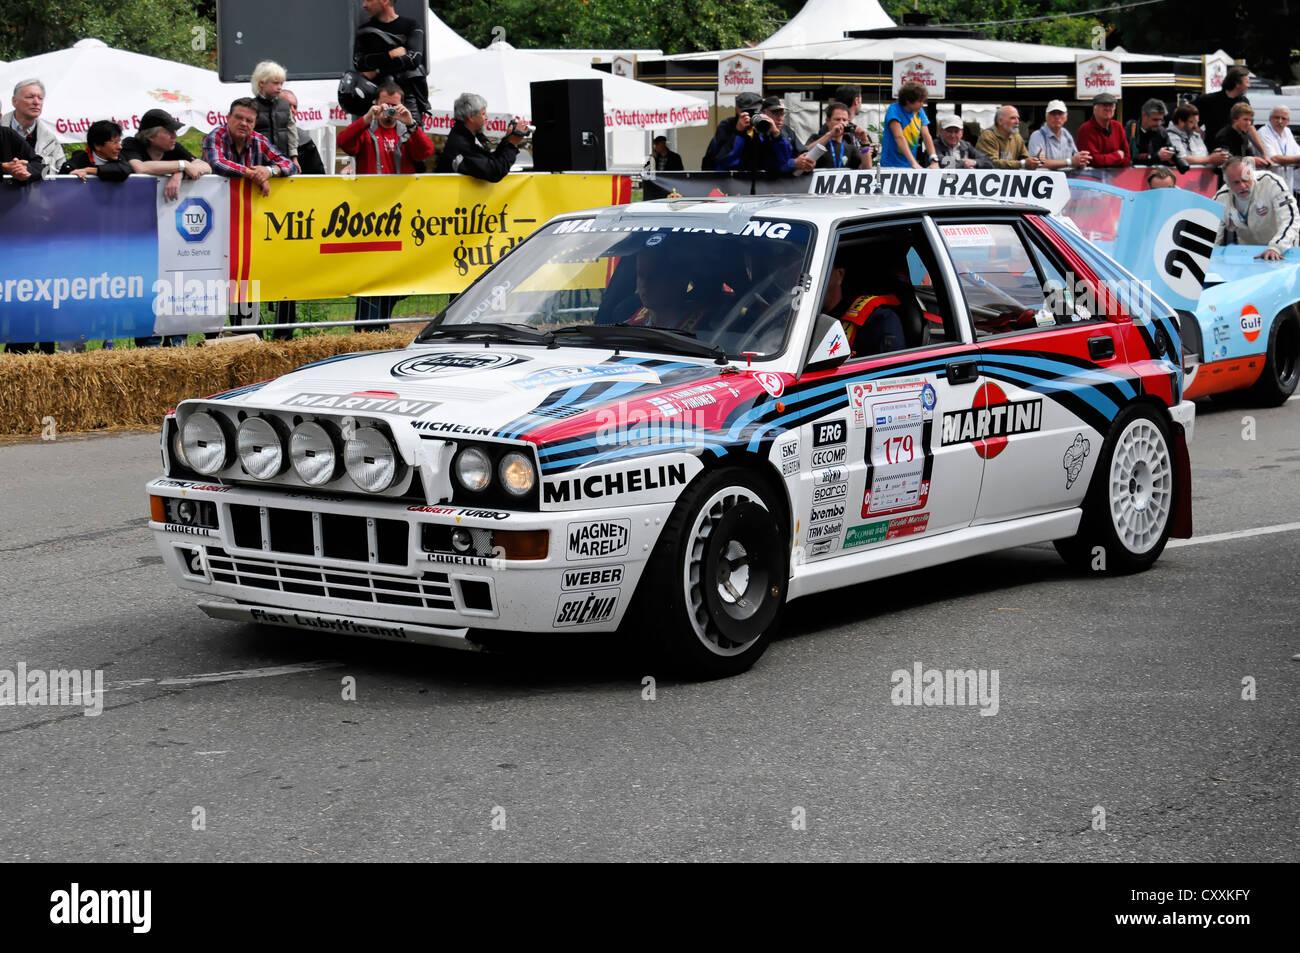 https://c8.alamy.com/comp/CXXKFY/lancia-delta-integrale-rally-built-in-1992-solitude-revival-2011-stuttgart-CXXKFY.jpg